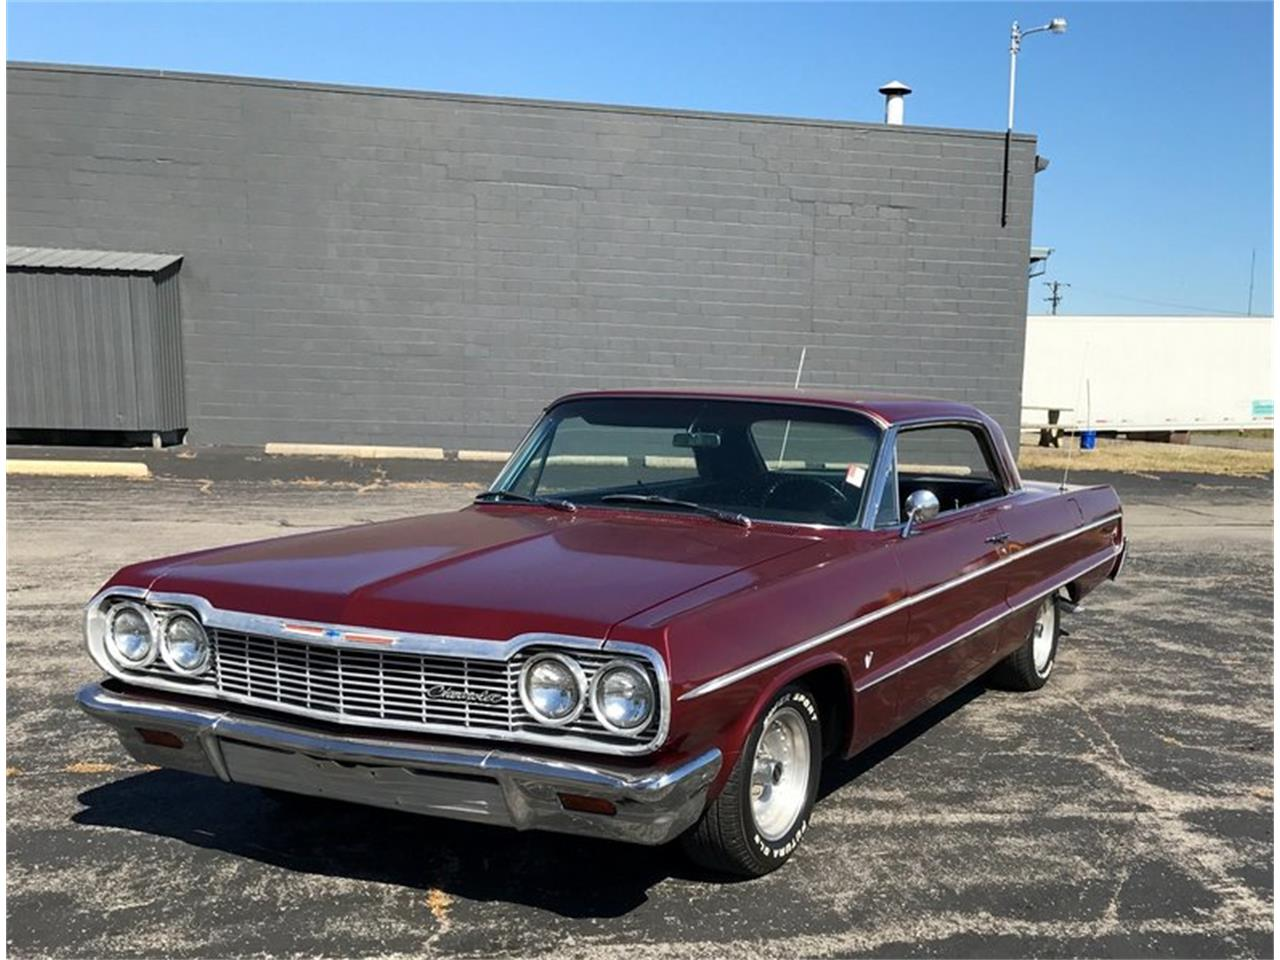 Chevy Dealers Dayton Ohio >> 1964 Chevrolet Impala for Sale | ClassicCars.com | CC-1028361